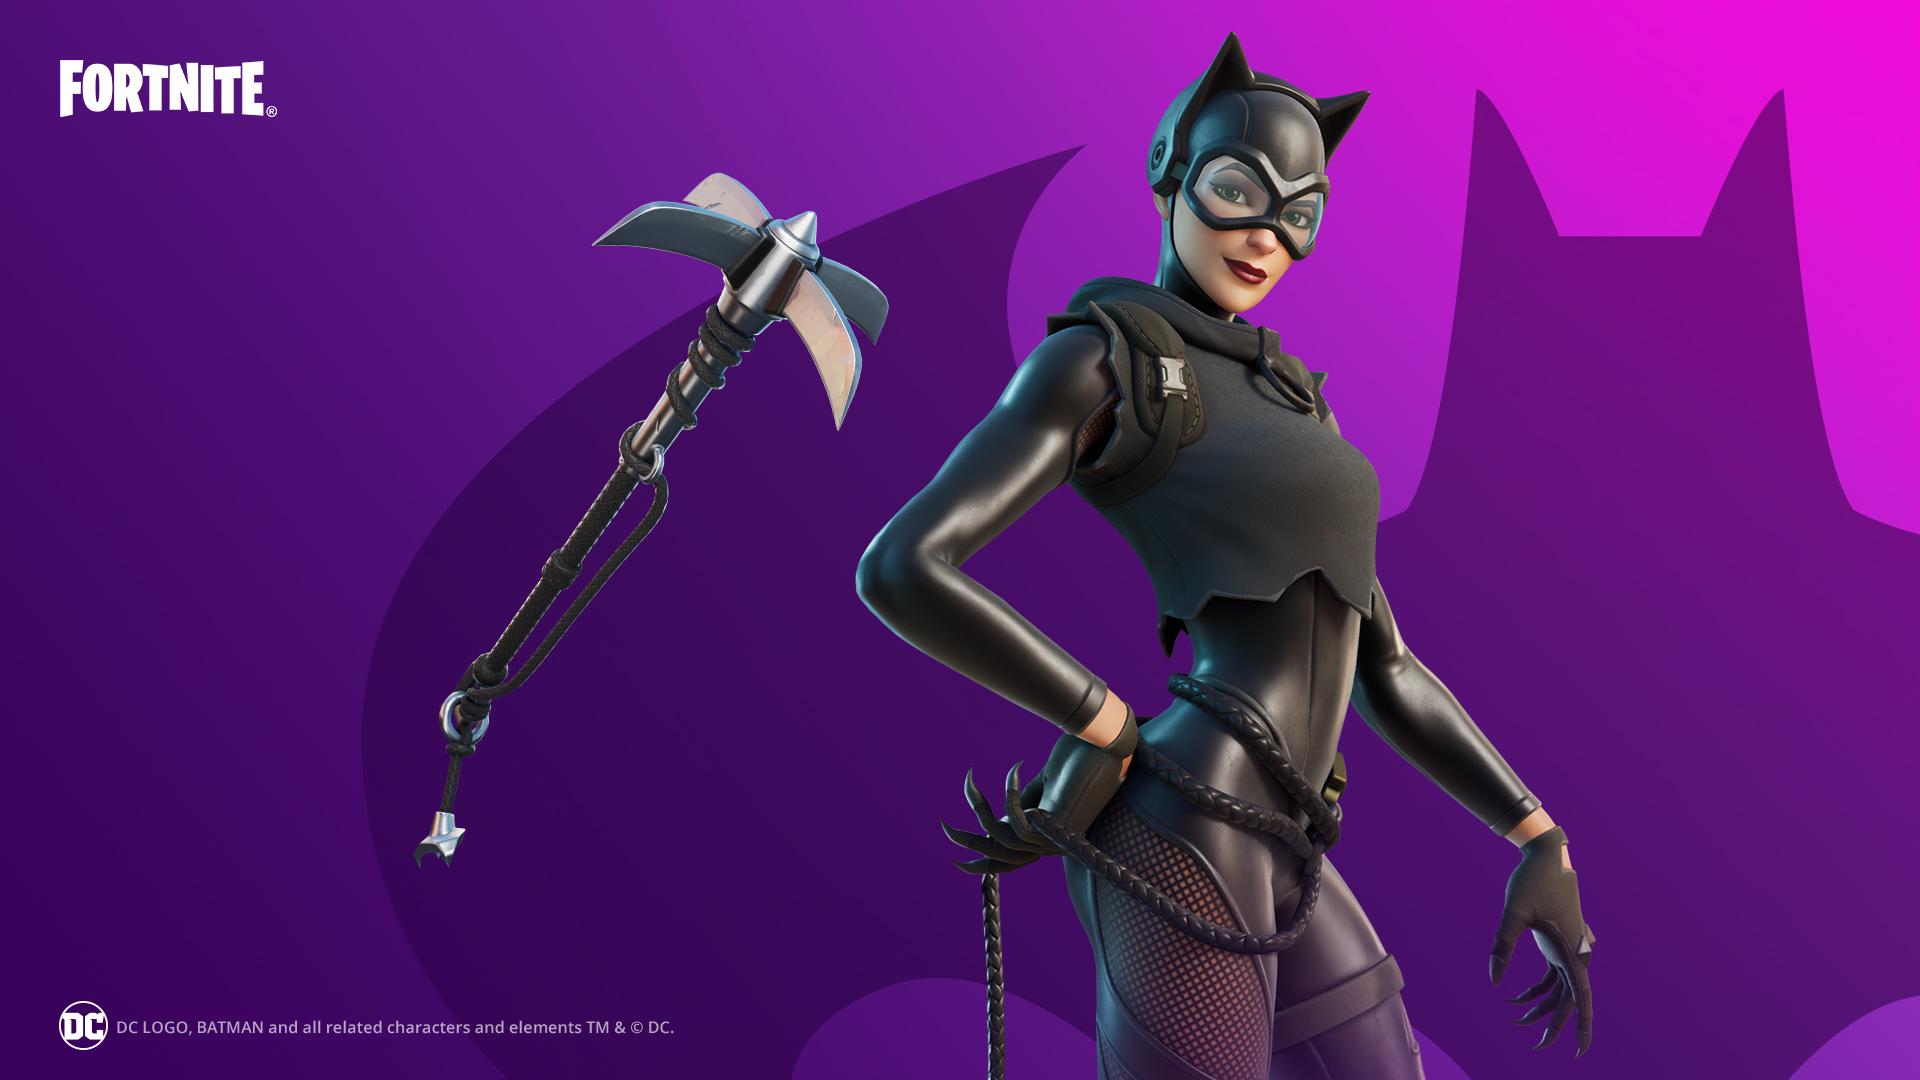 Catwoman Fortnite skin